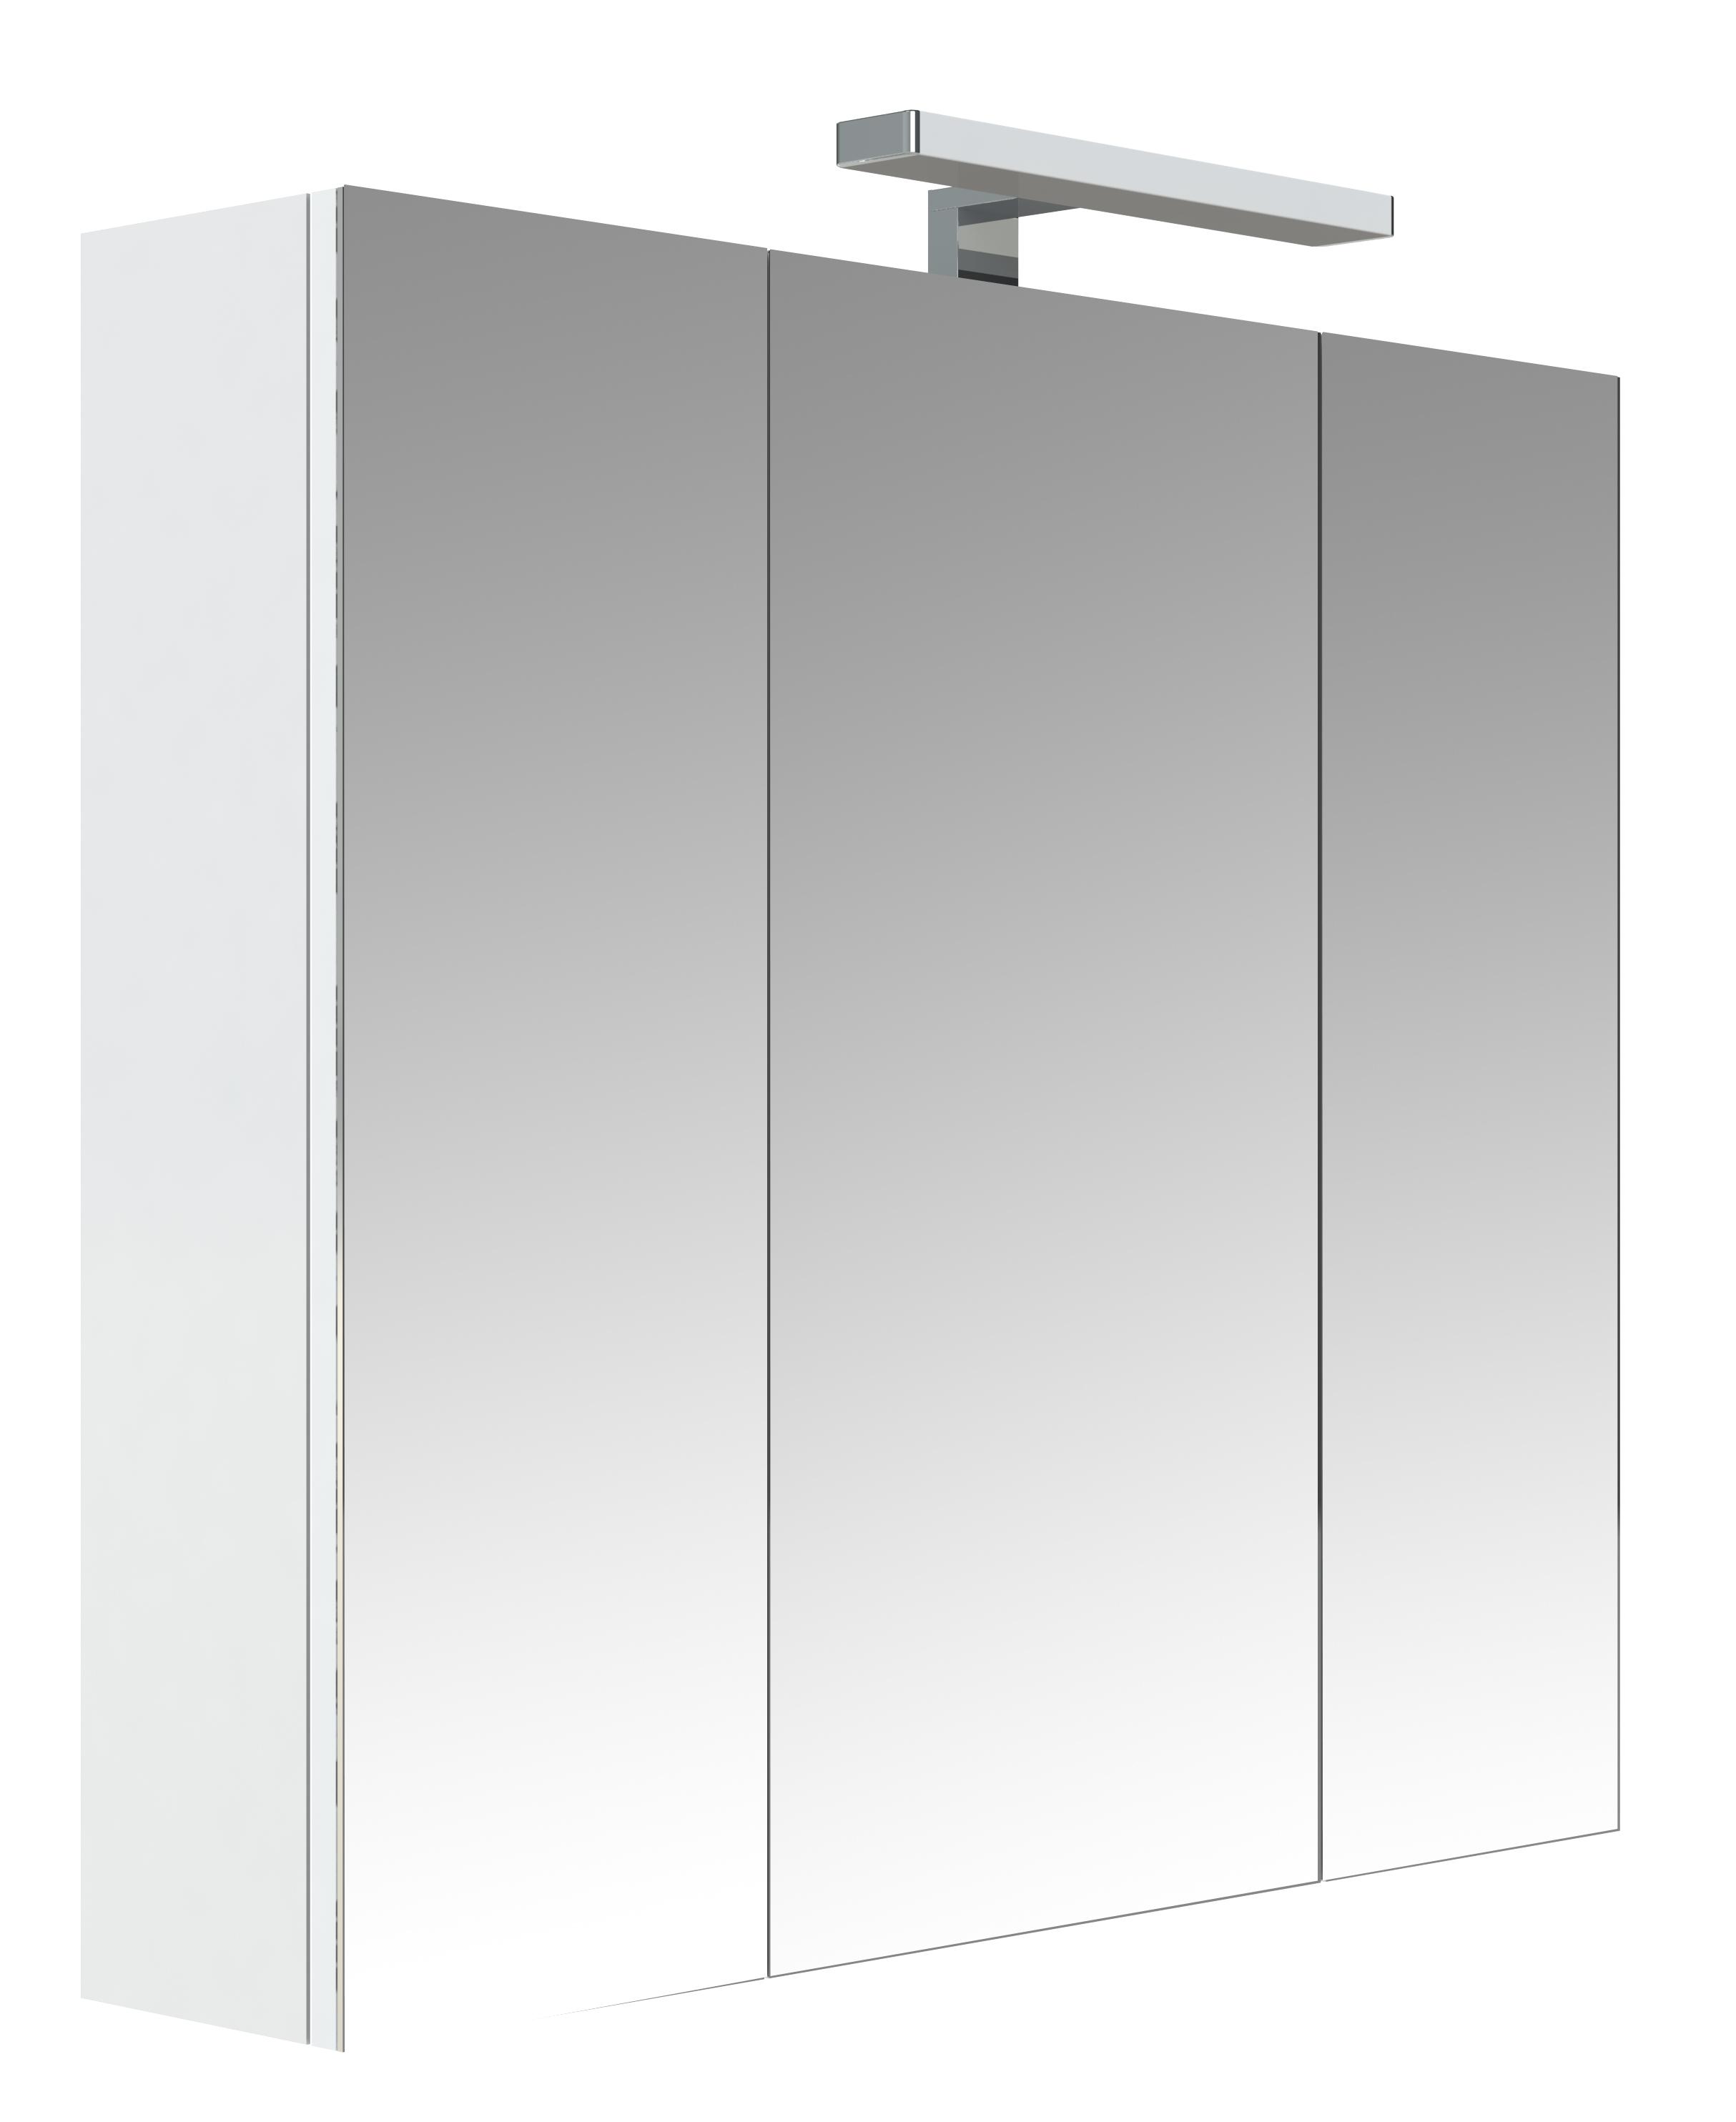 armoire de toilette melodia aquarine pro. Black Bedroom Furniture Sets. Home Design Ideas